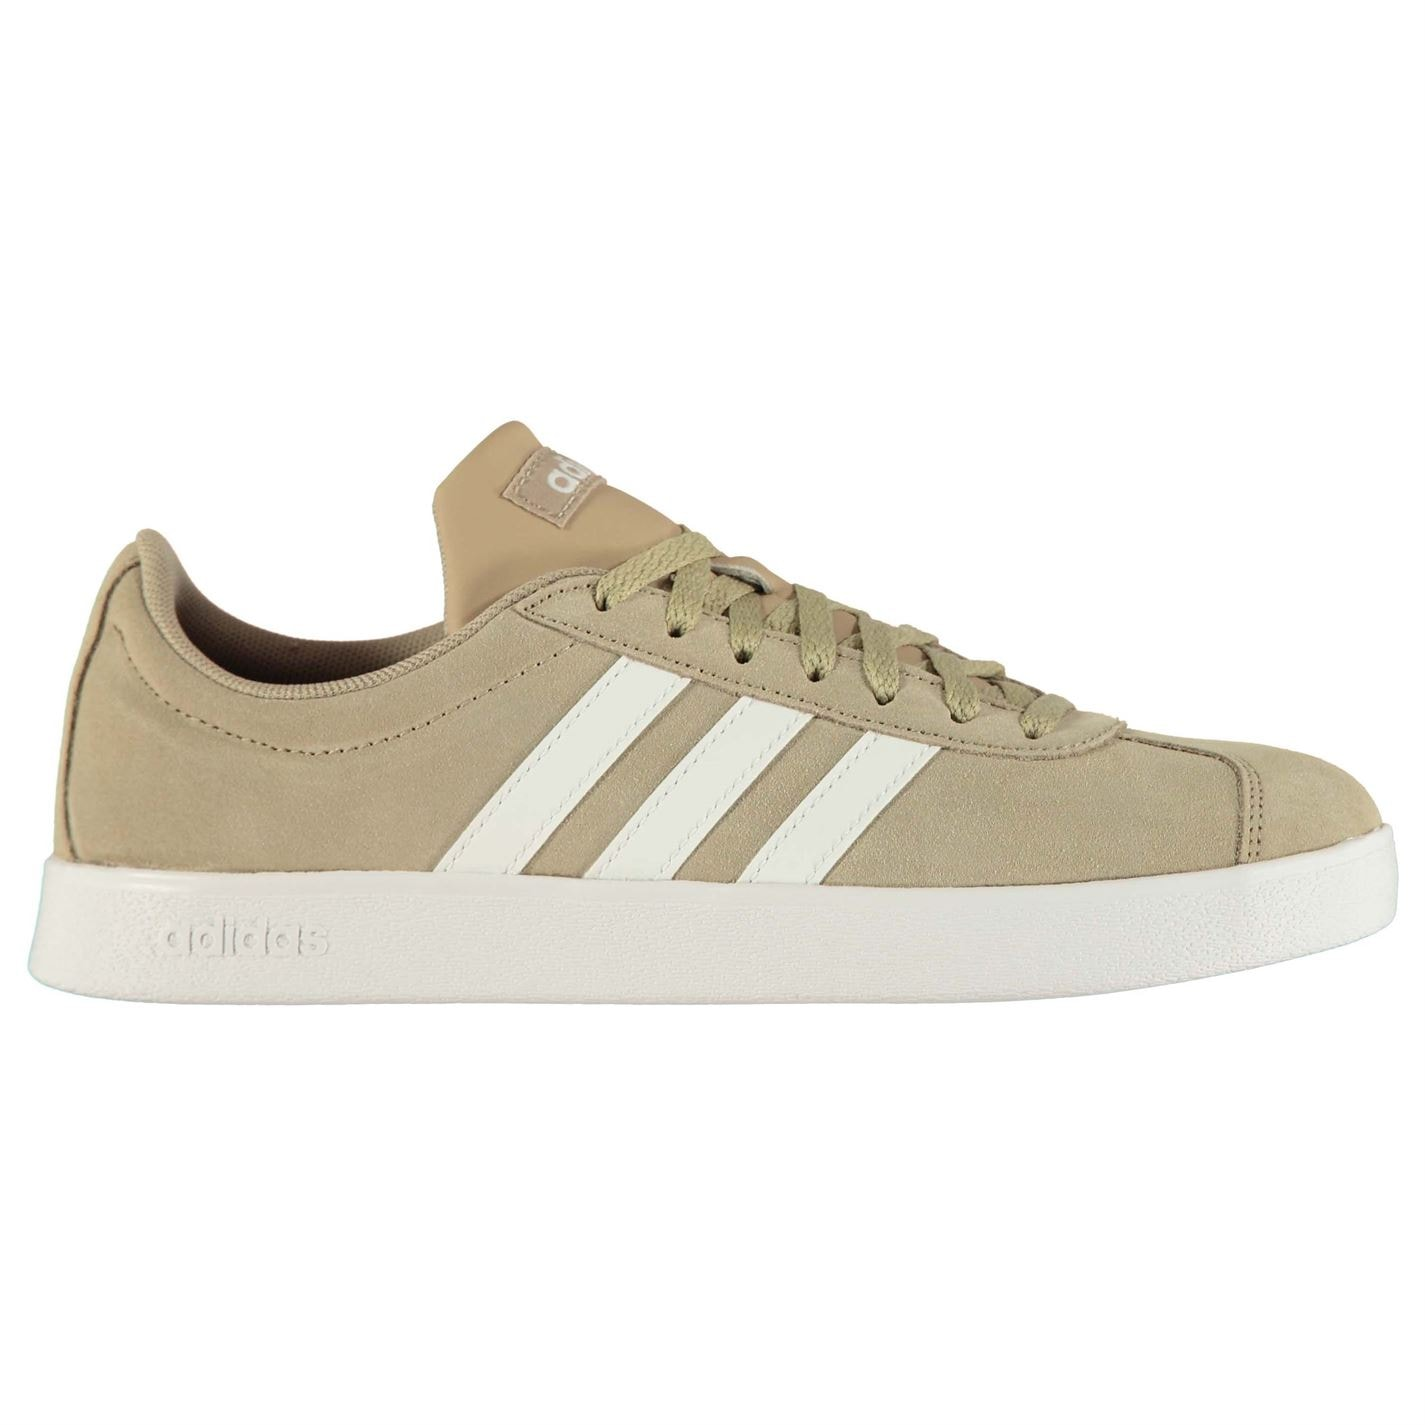 Adidas VL Court 2 Suede Pánská obuv 16303804 9 (43.3)